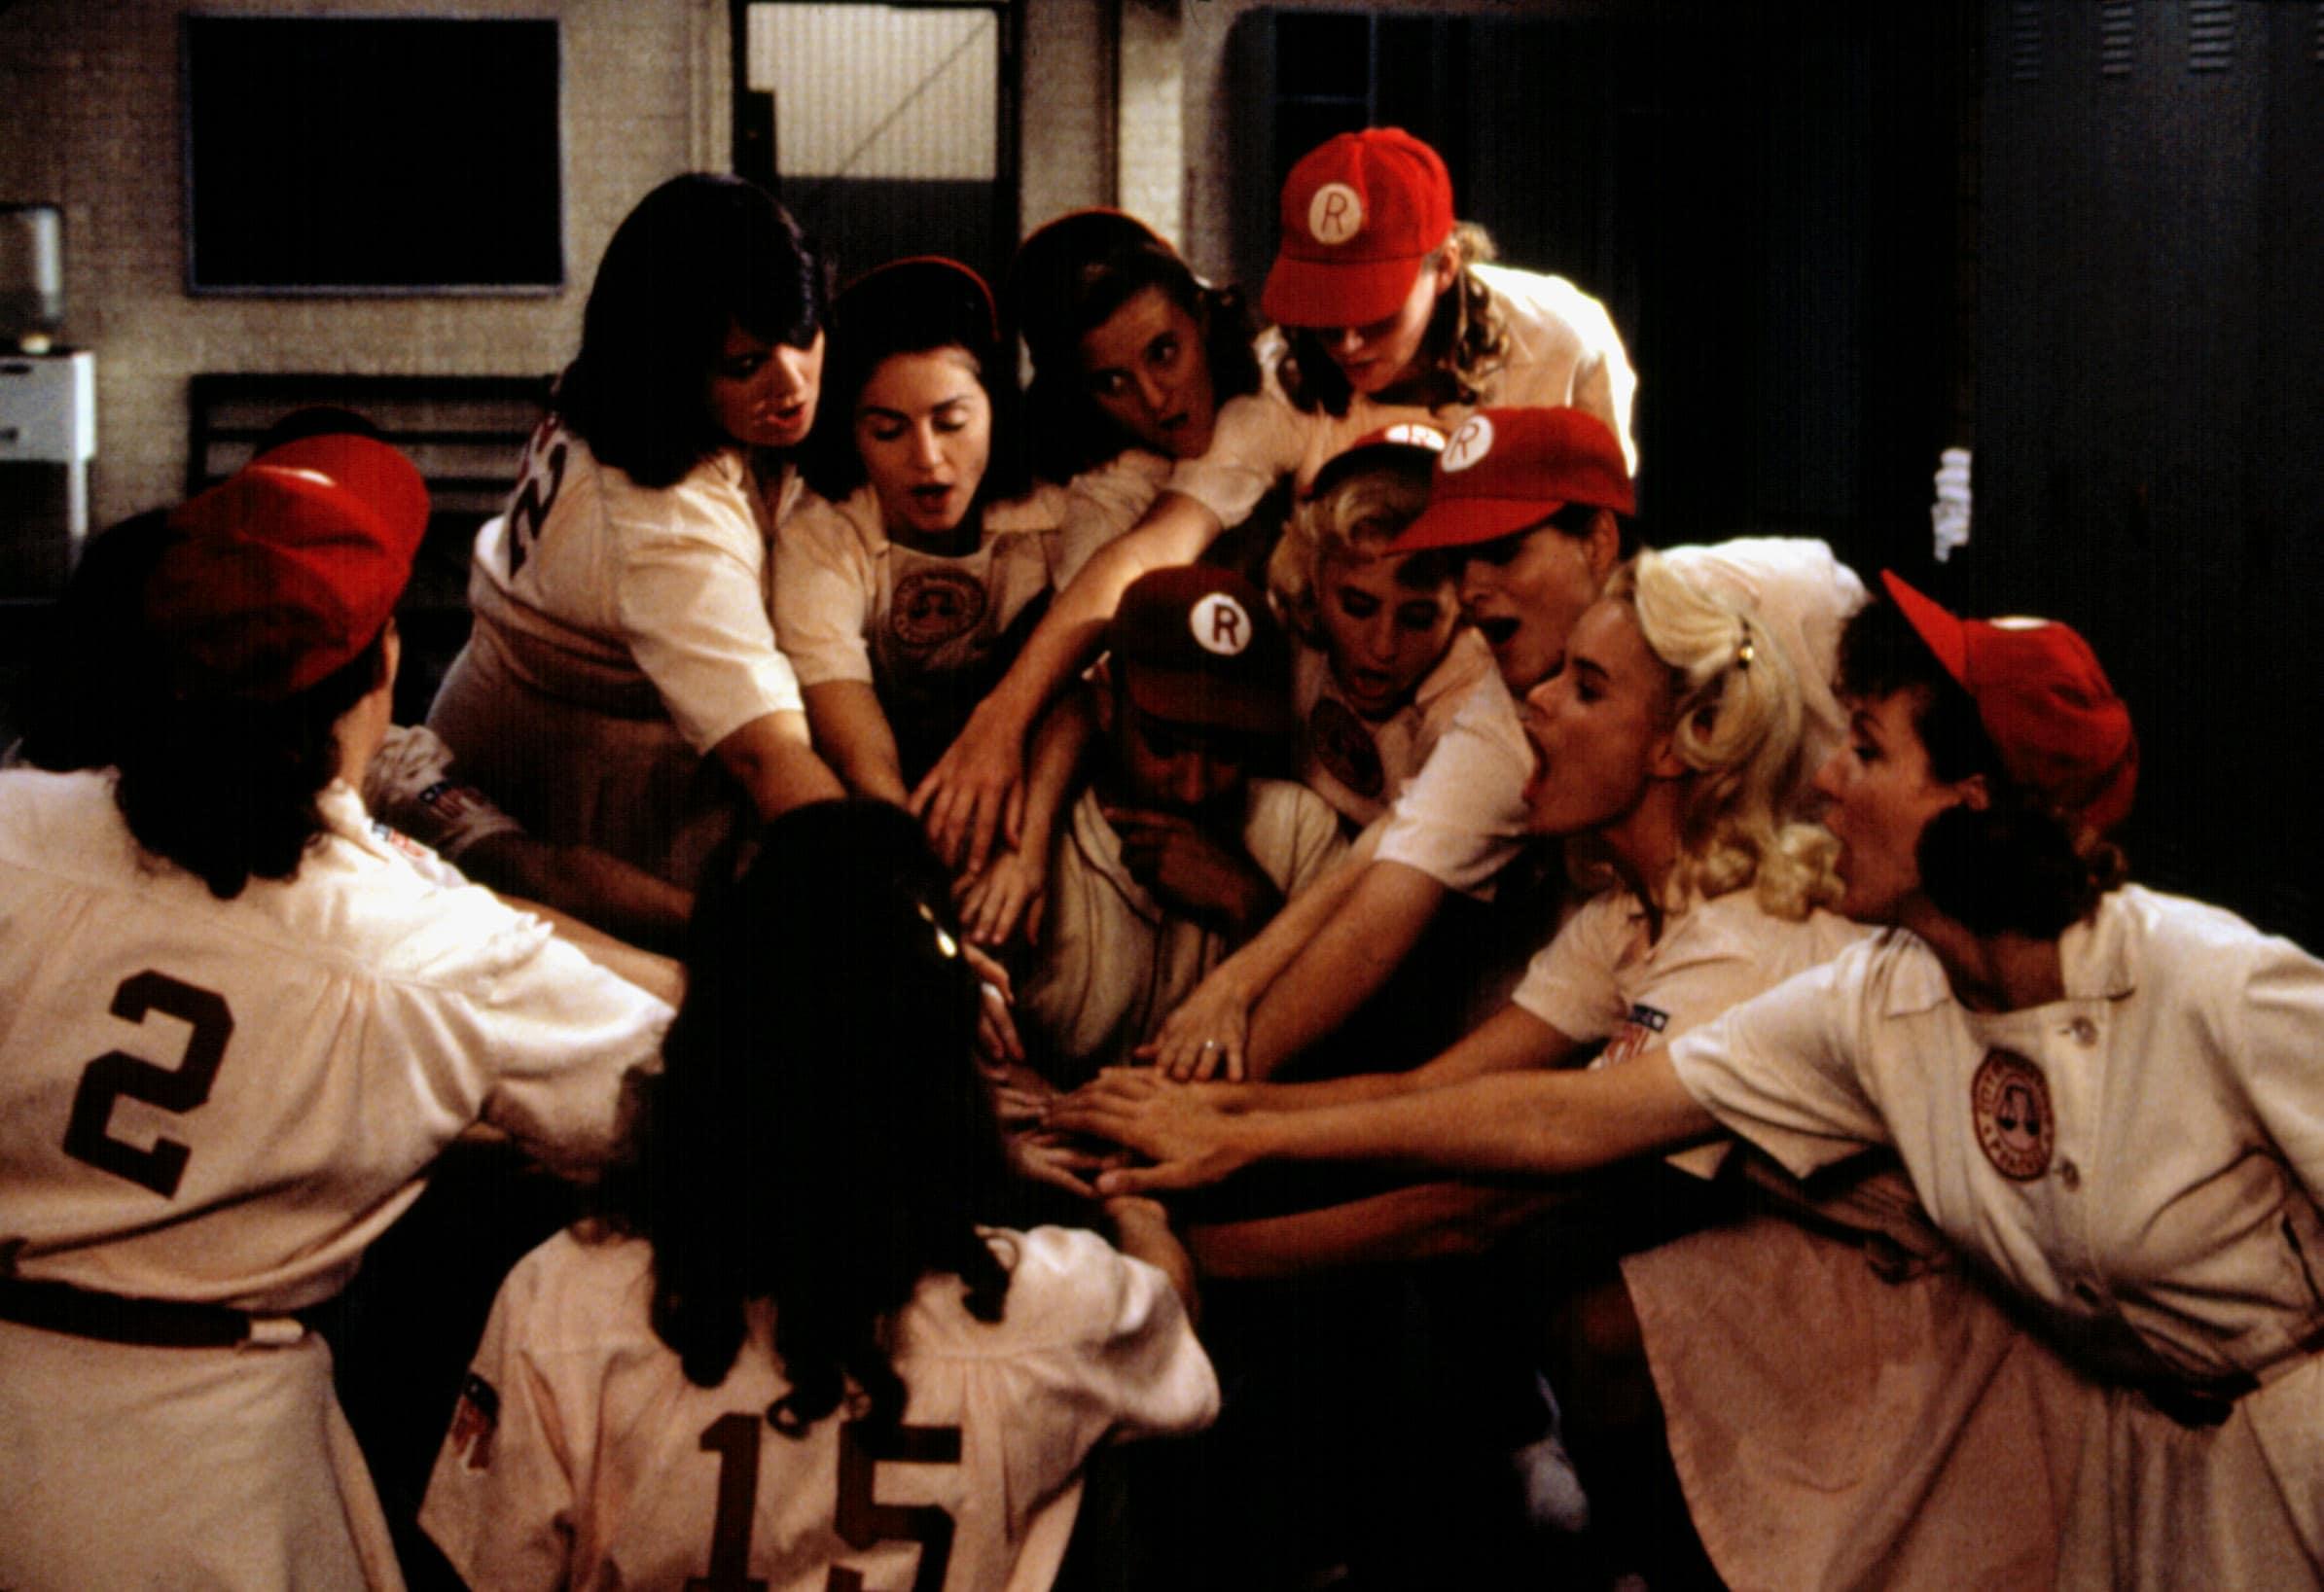 A LEAGUE OF THEIR OWN, Rosie O'Donnell, Madonna, Tom Hanks, Lori Petty, Bitty Schram, Freddie Simpson, 1992